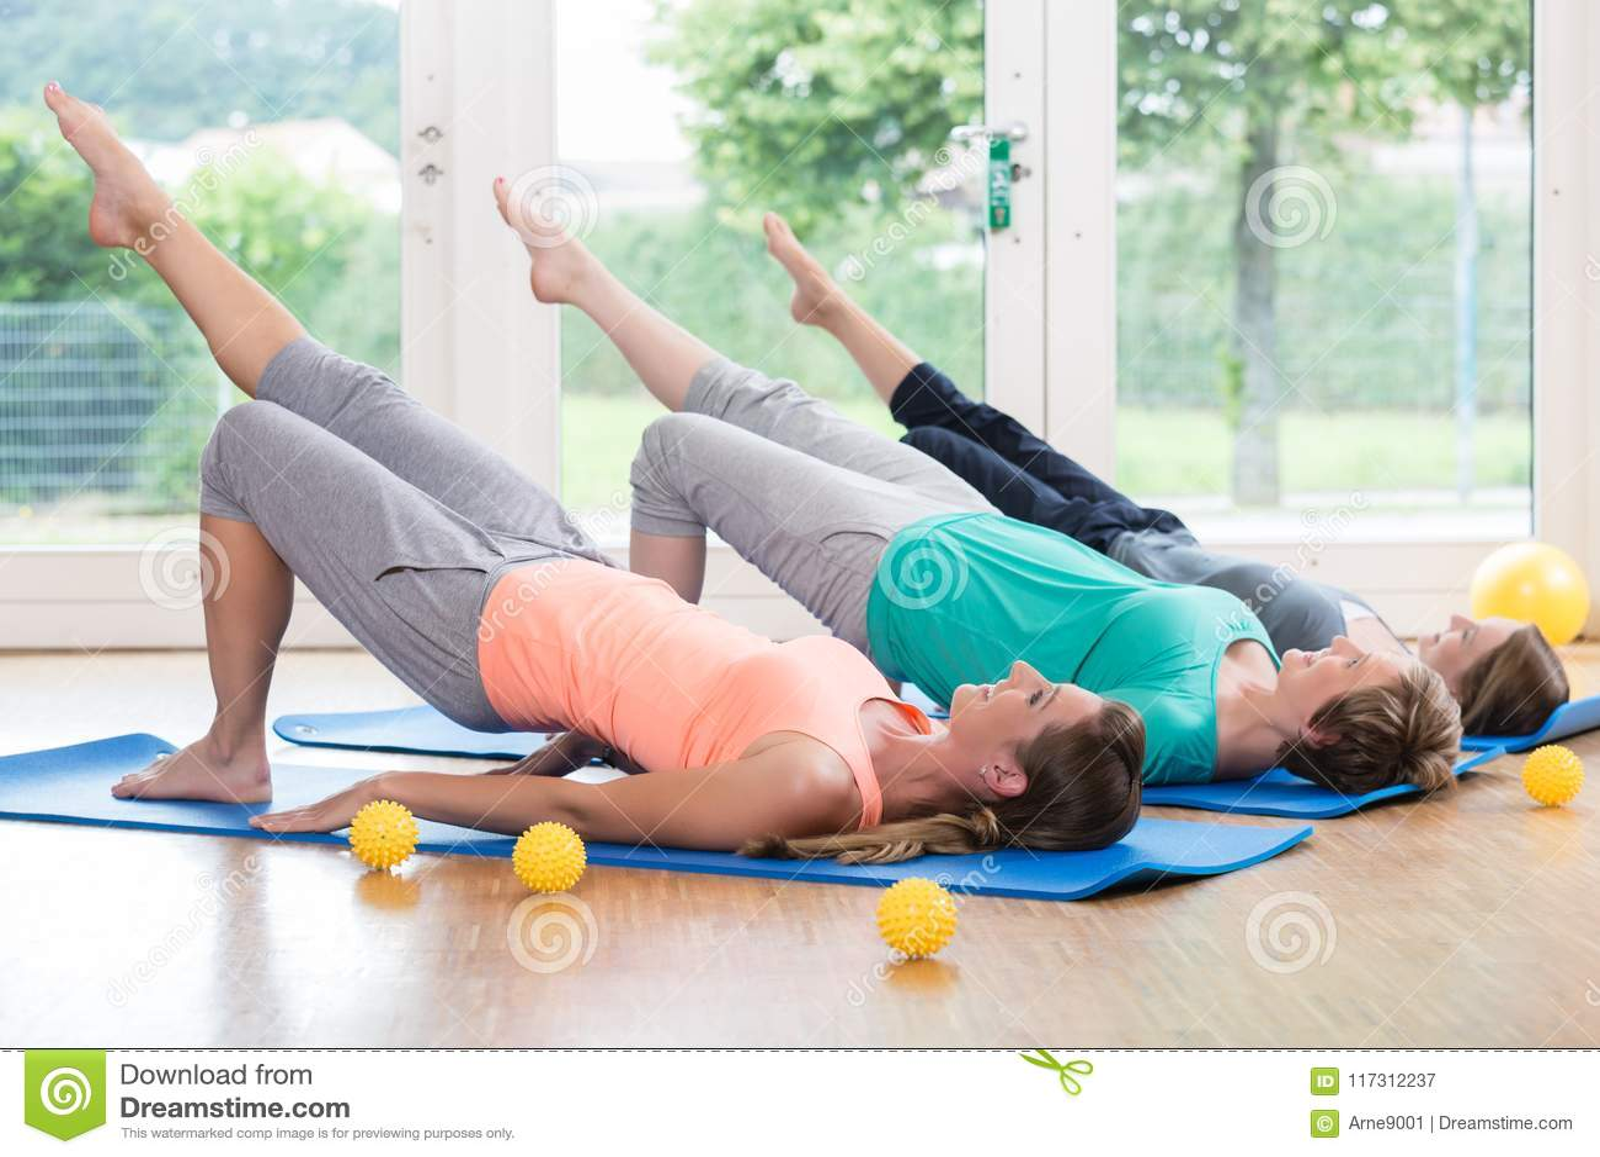 Women doing exercises for pelvis floor in postnatal course